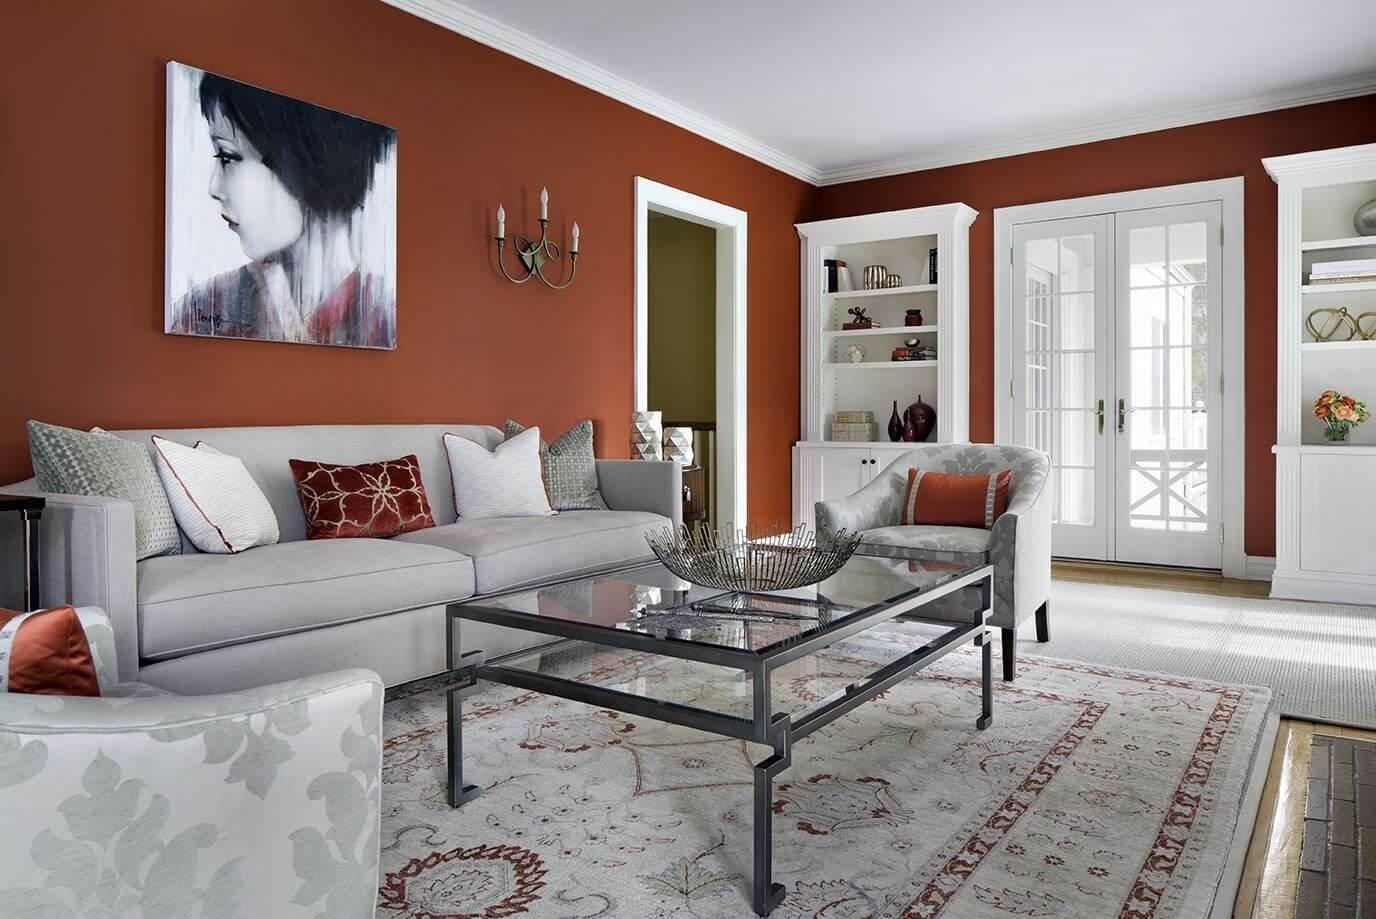 10 Stylish Living Room Color Scheme Ideas living room room paint colors living room paint ideas for black